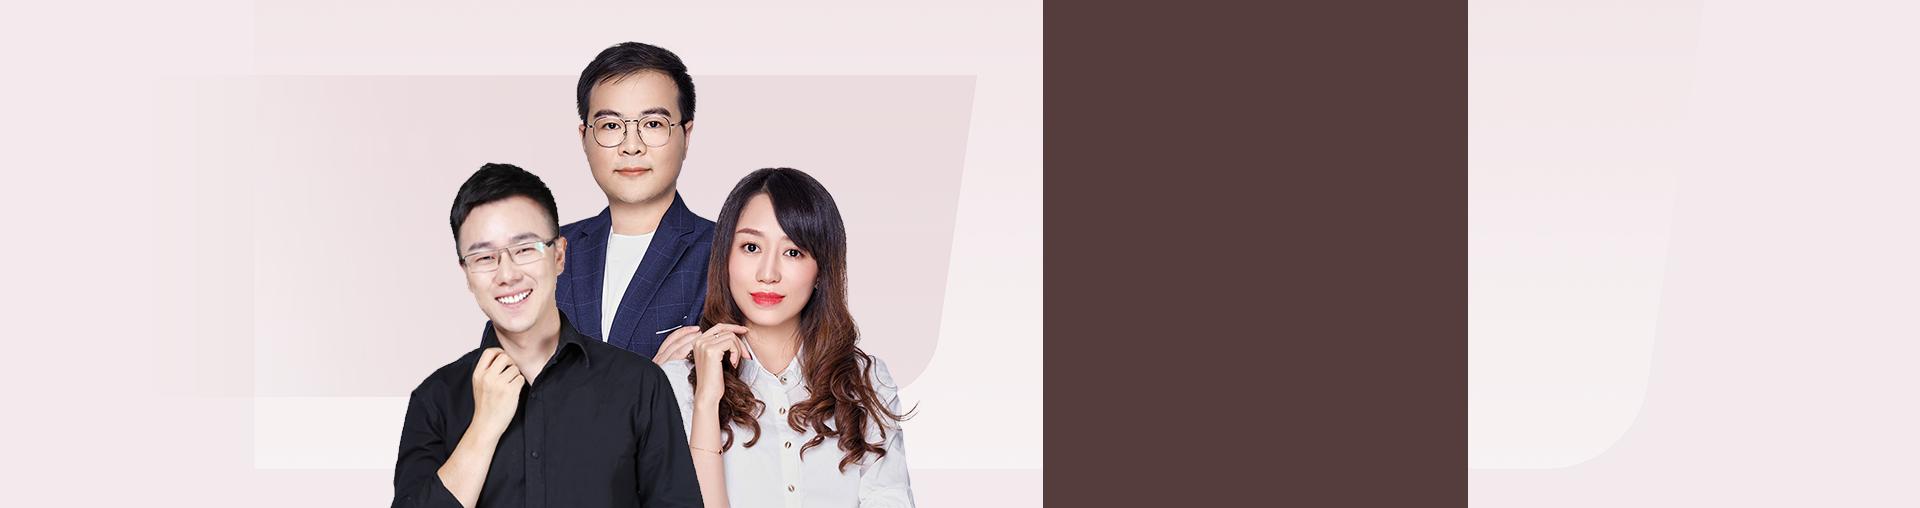 【APP拼团0.1元,新初二】语数英抢分集训营